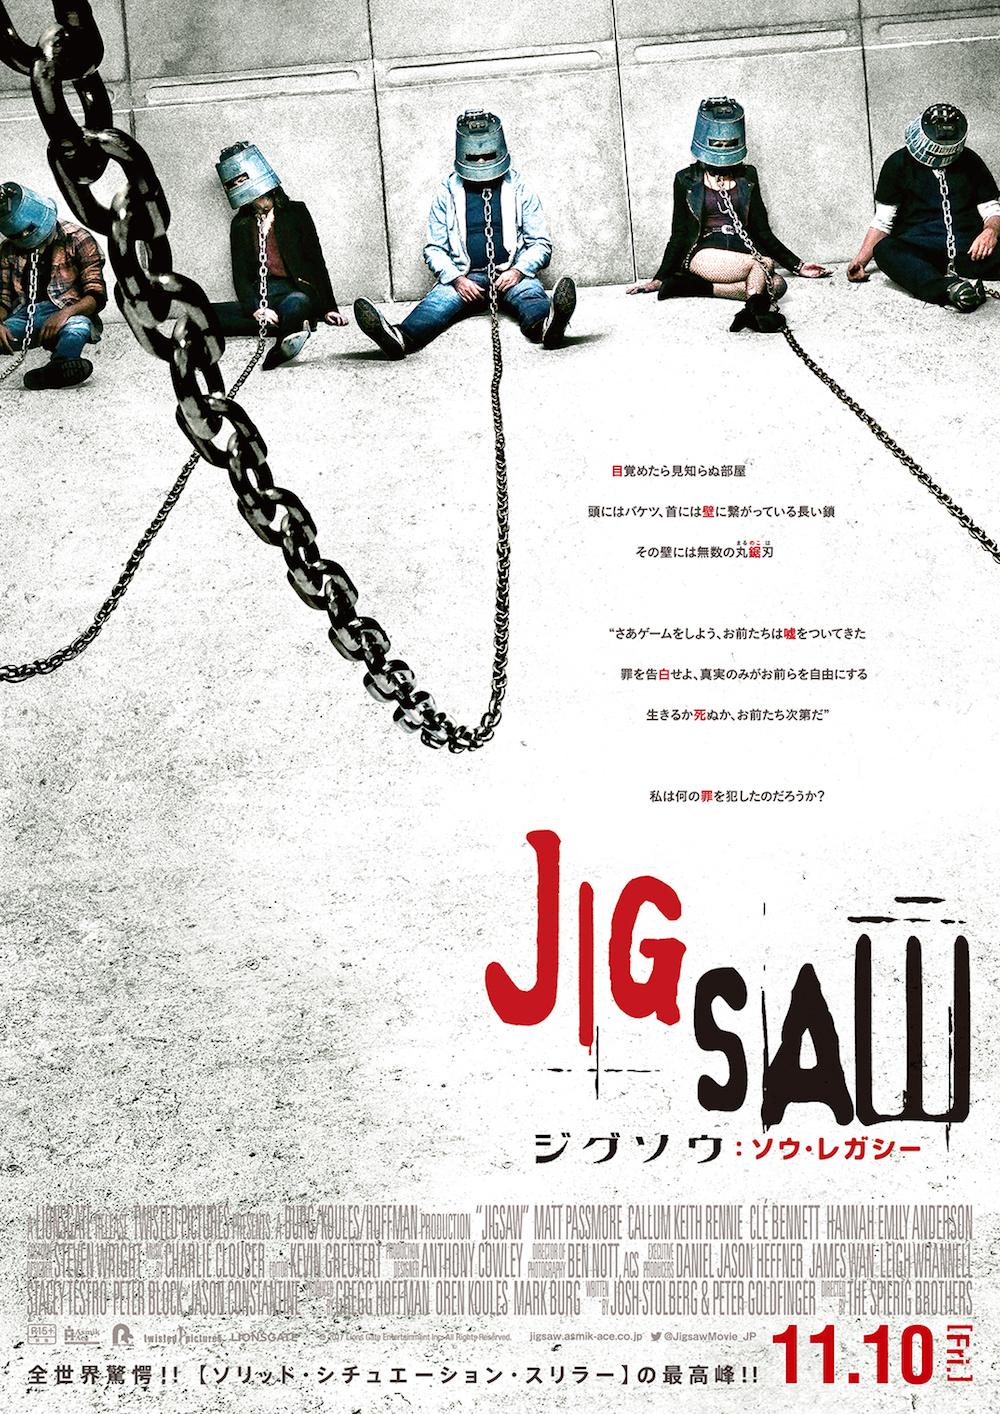 jigsaw_poster_0925_初校ol